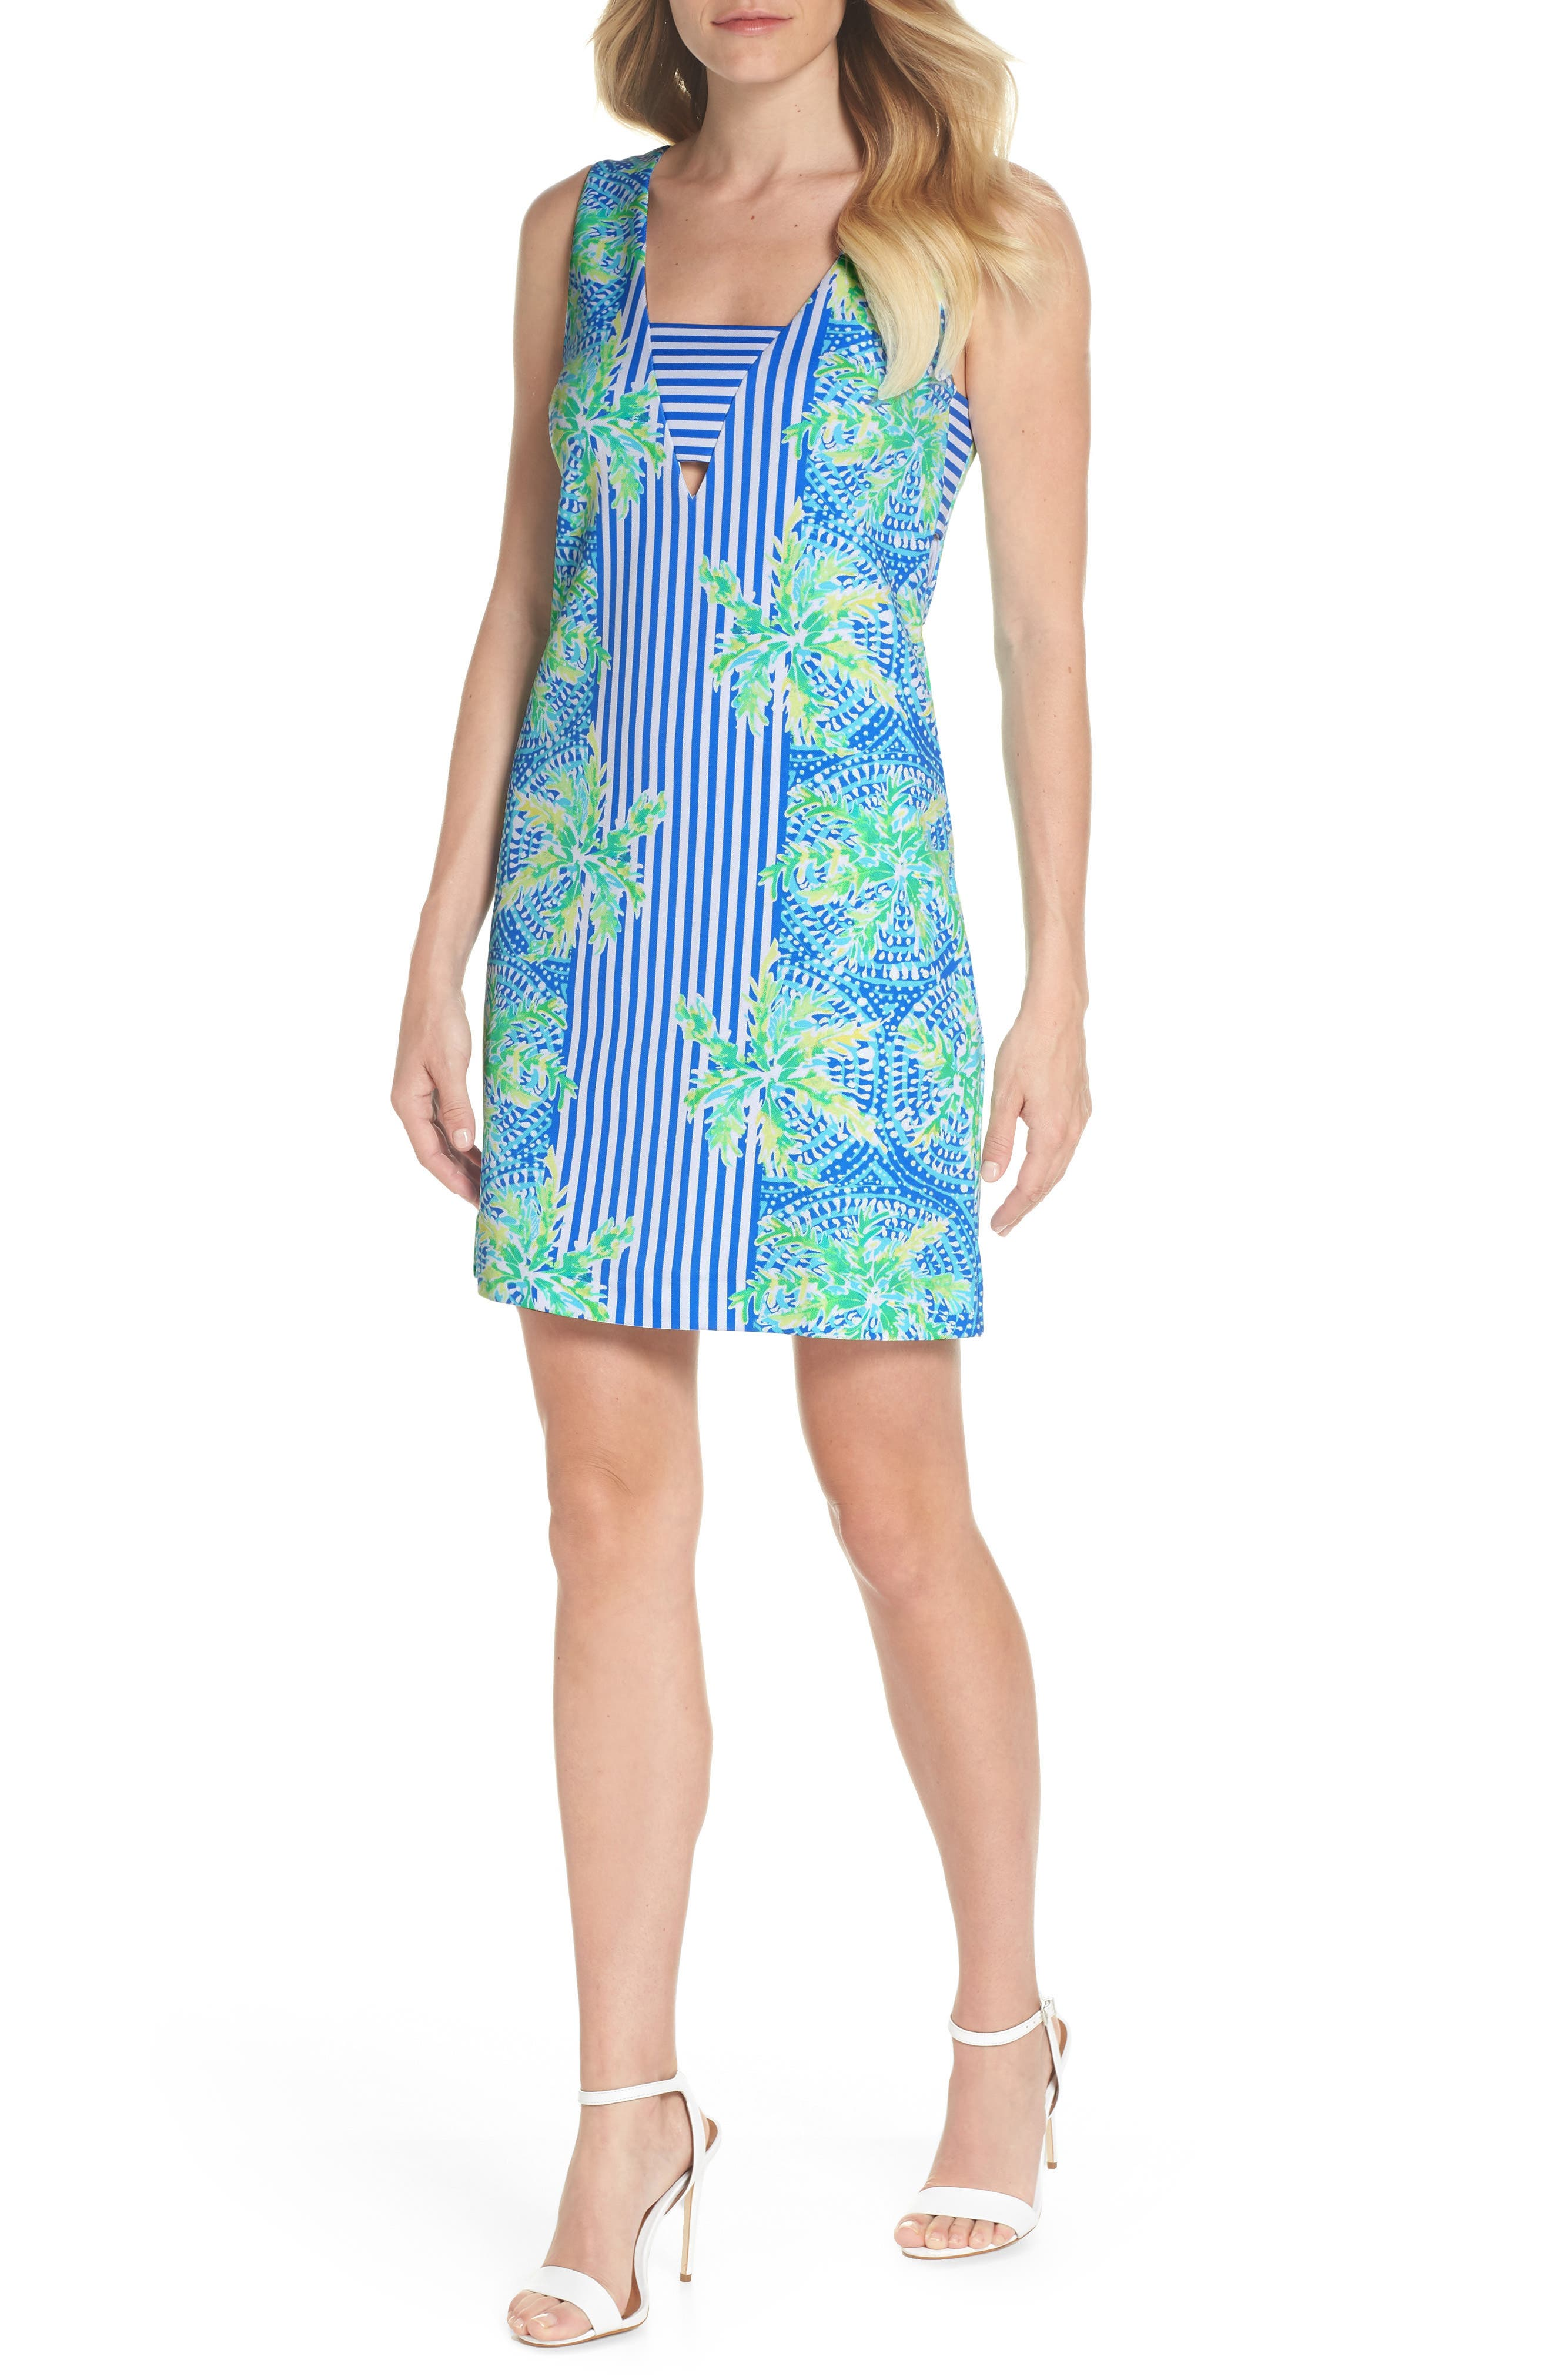 Chiara Stripe & Floral Print Dress,                             Main thumbnail 1, color,                             BENNET BLUE TROPIC LIKE ITS